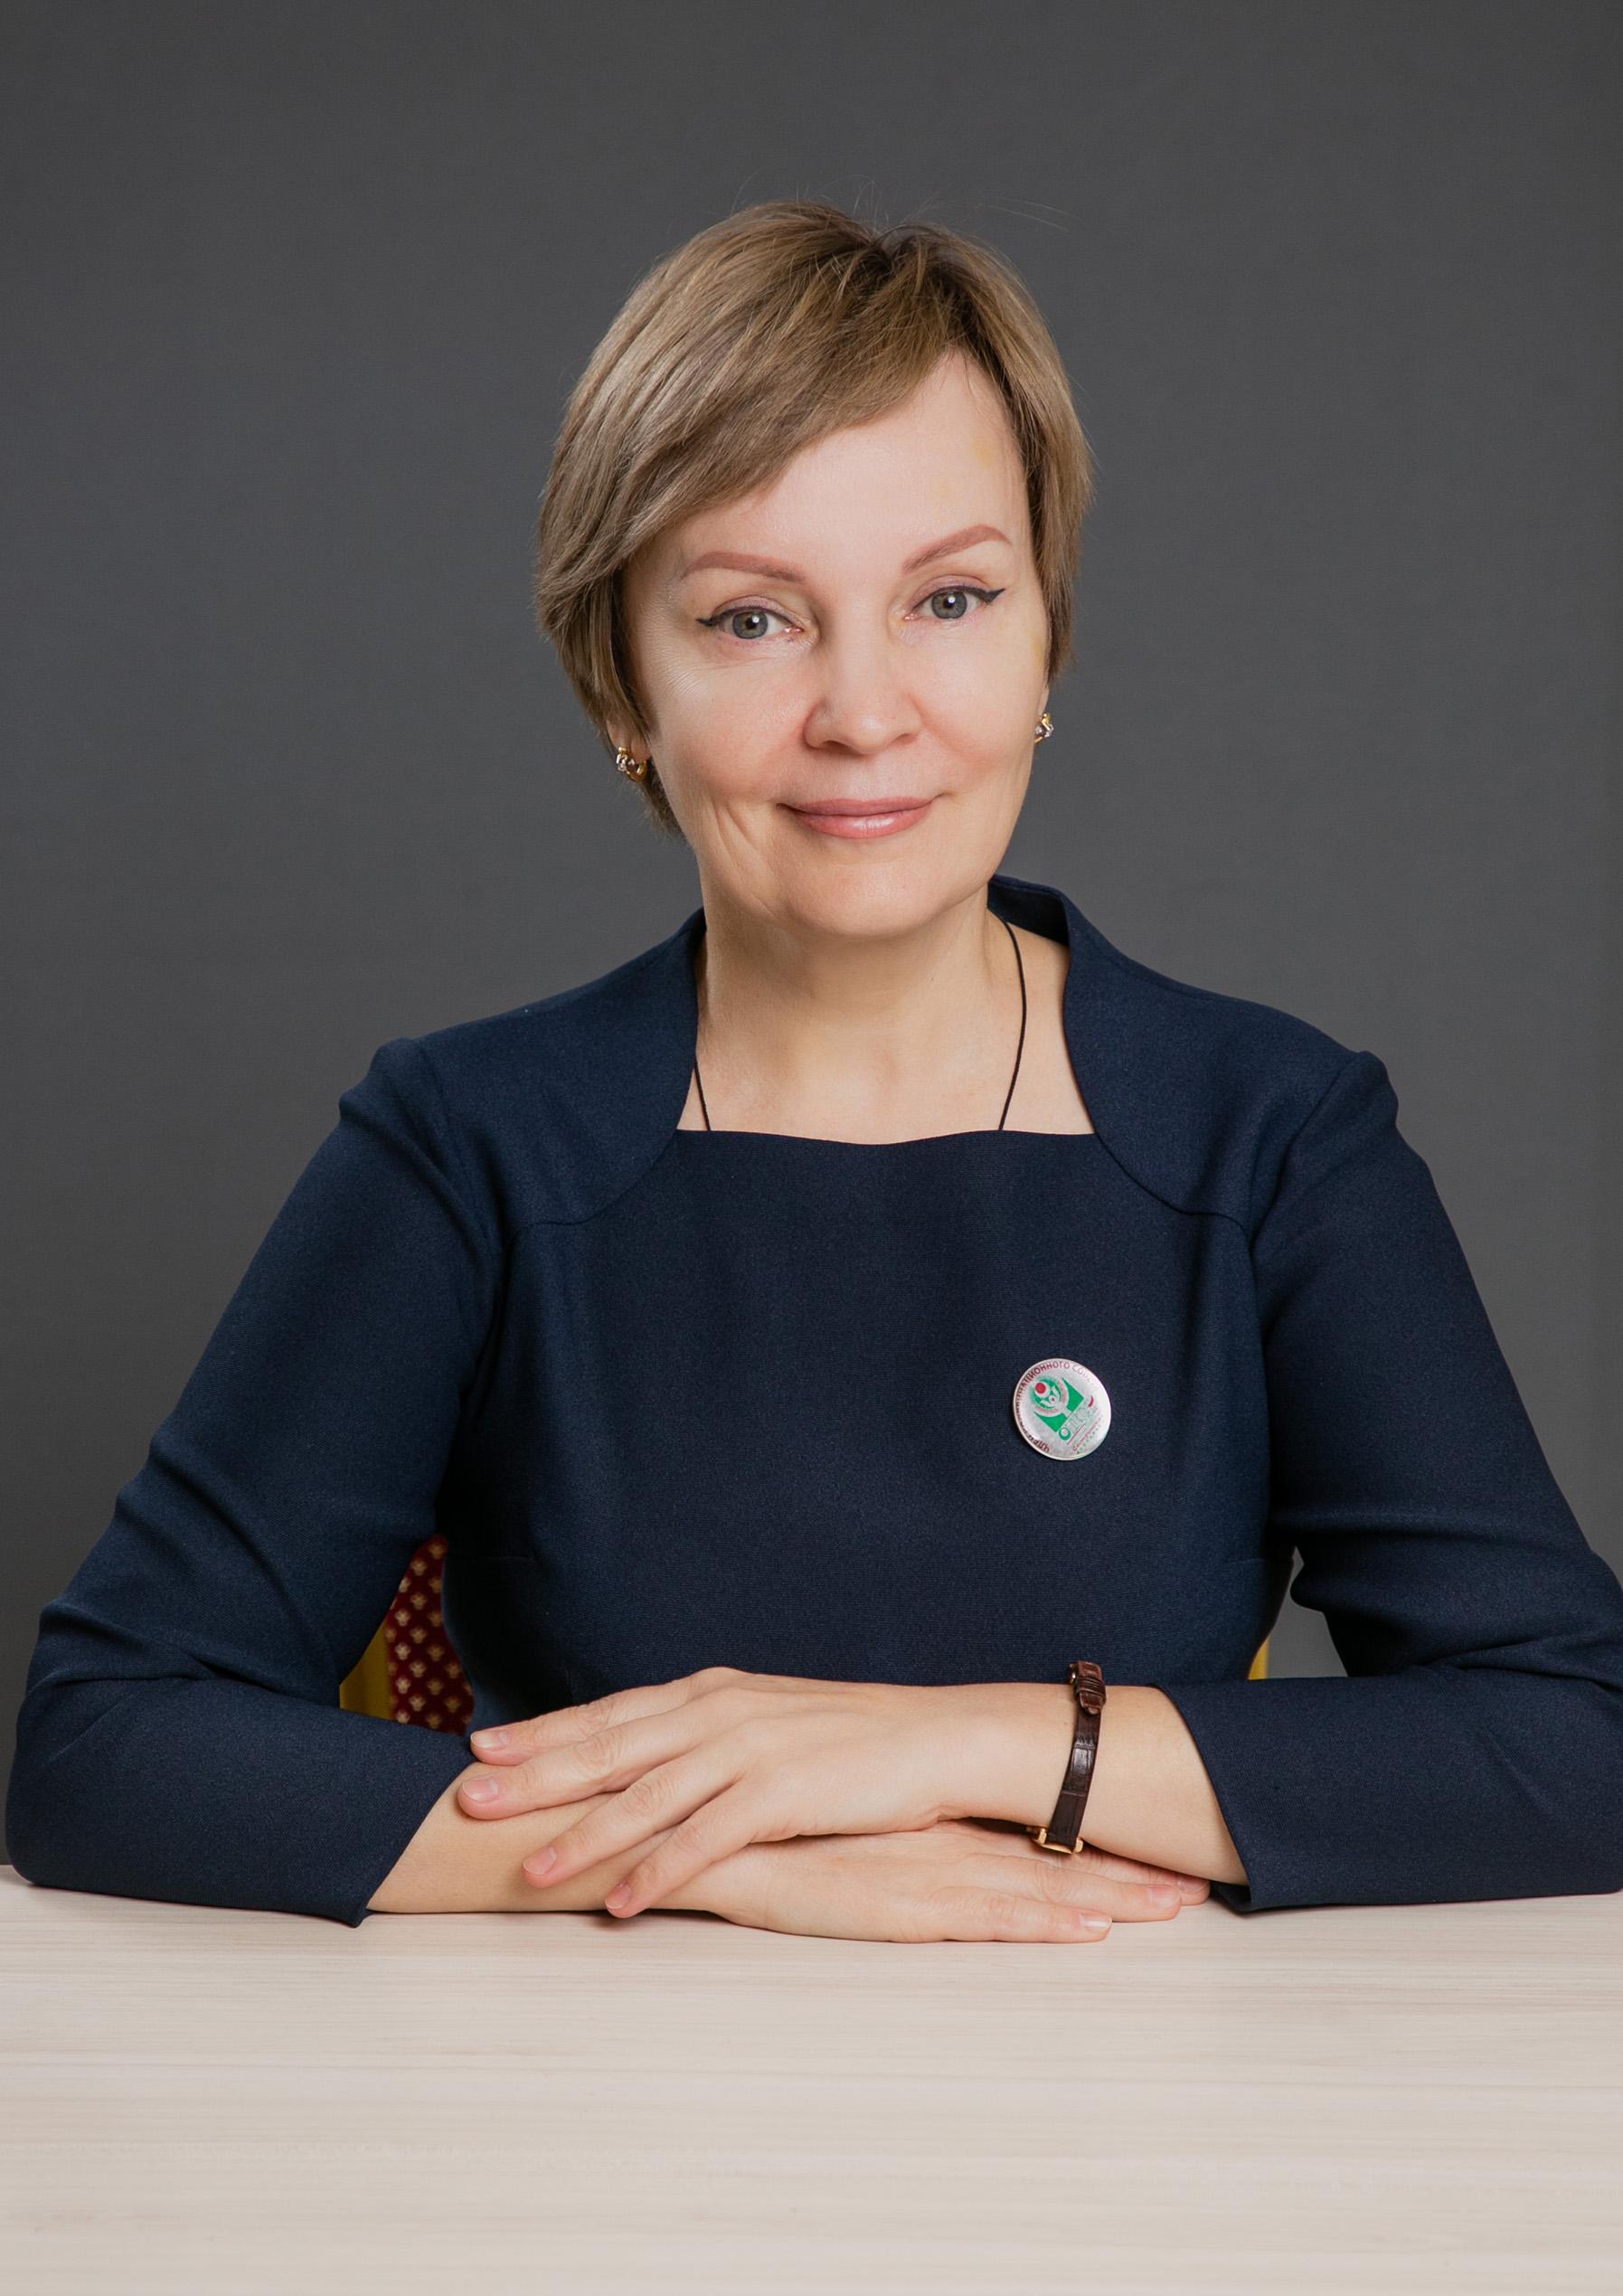 Кобкова Лариса Викторовна